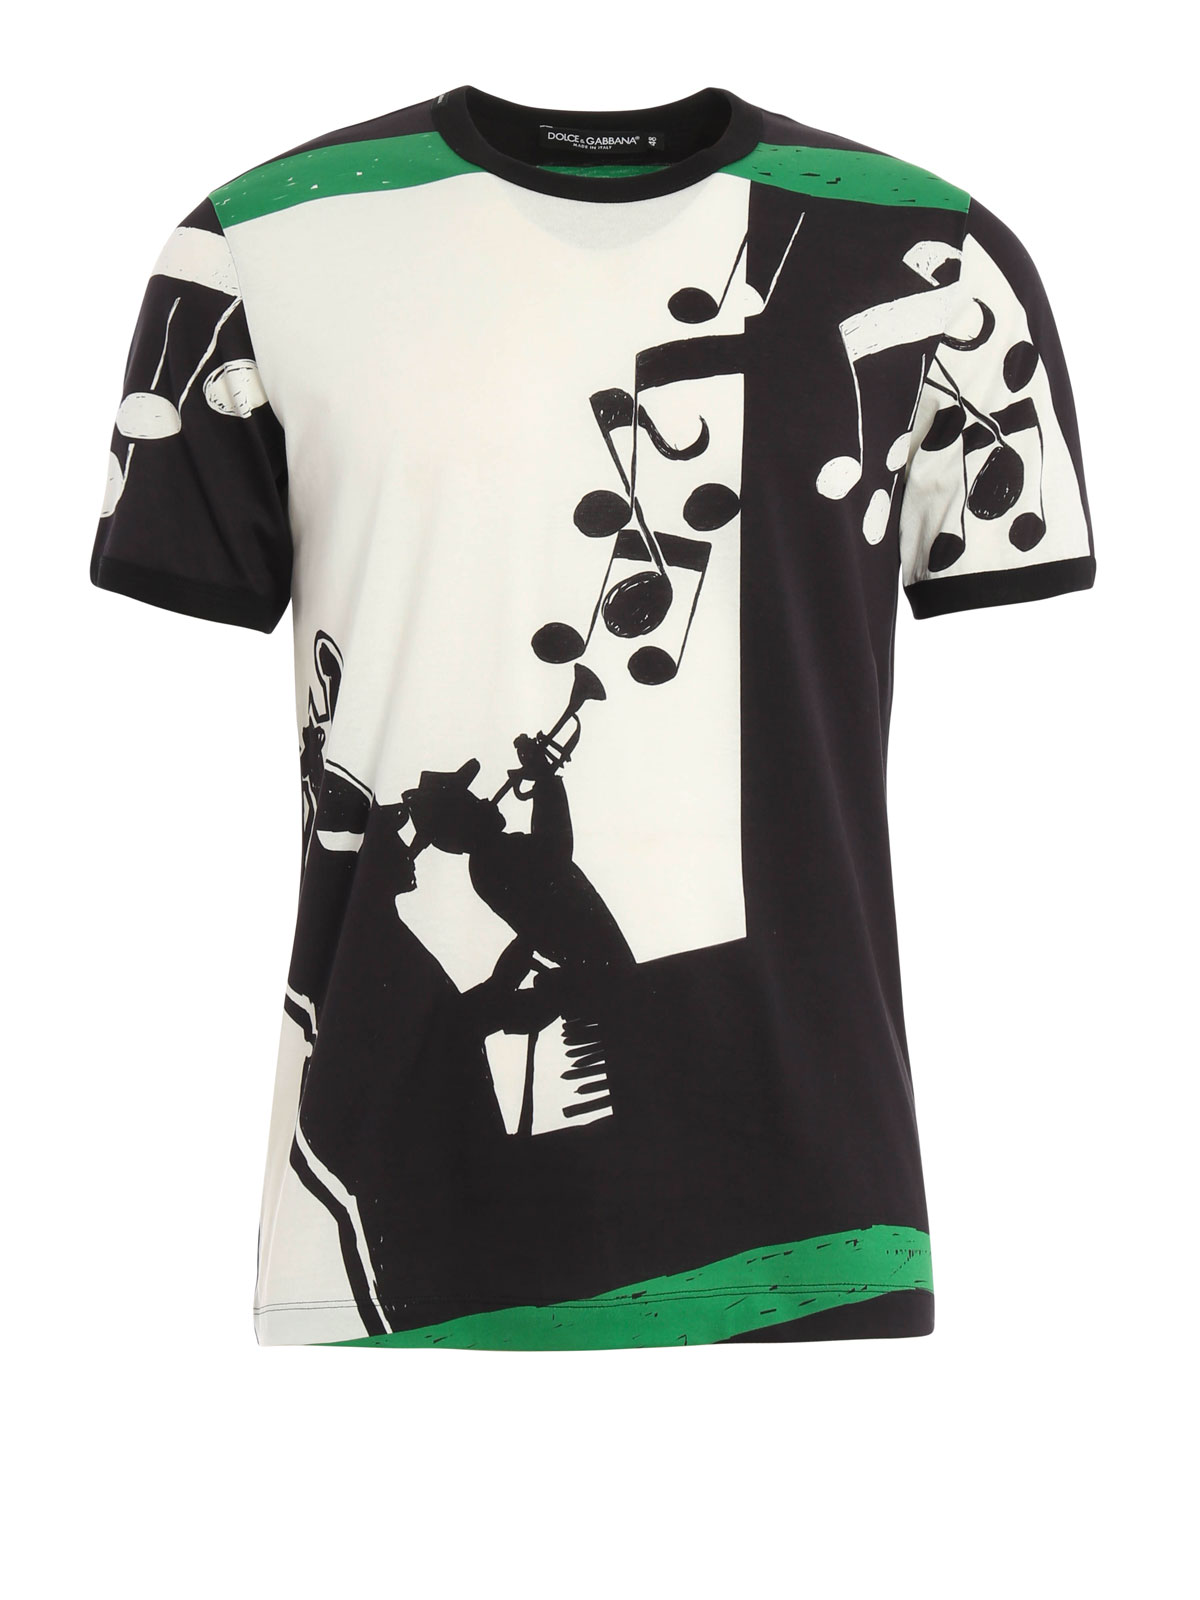 f8d8b360ee6ccb Dolce   Gabbana - T-Shirt Fur Herren - Bunt - T-shirts ...